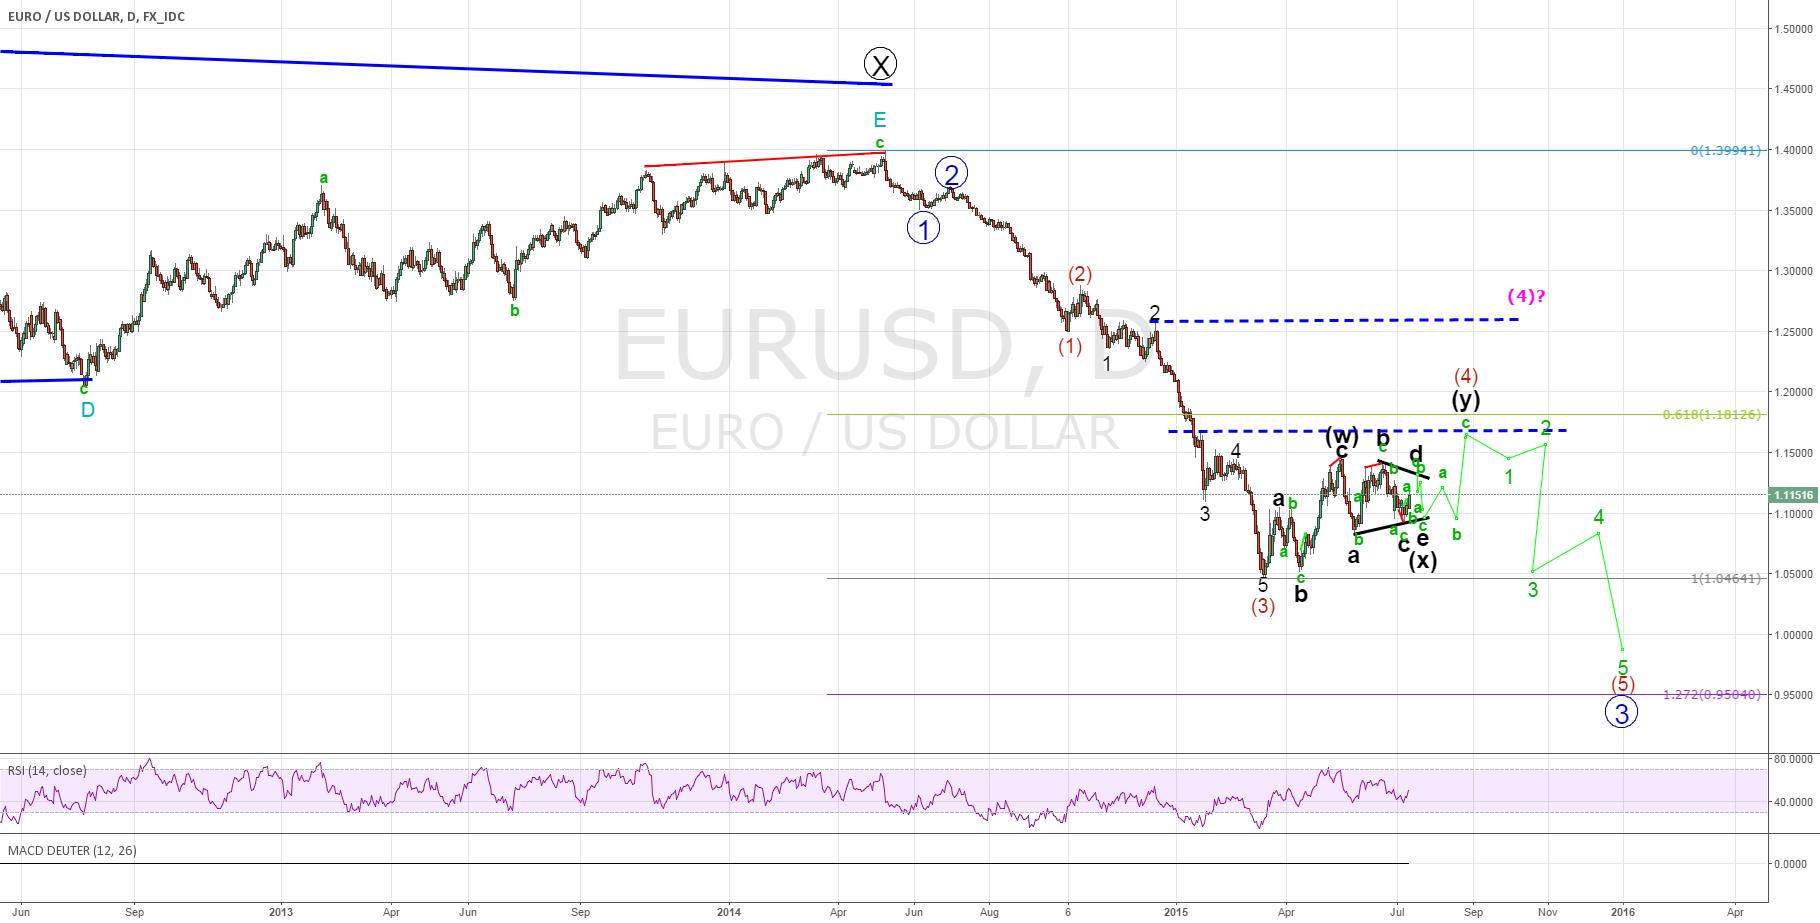 "'BIG"" PICTURE OF EURO DOLLAR ELLIOTT WAVE FIBONACCI ANALYSIS"